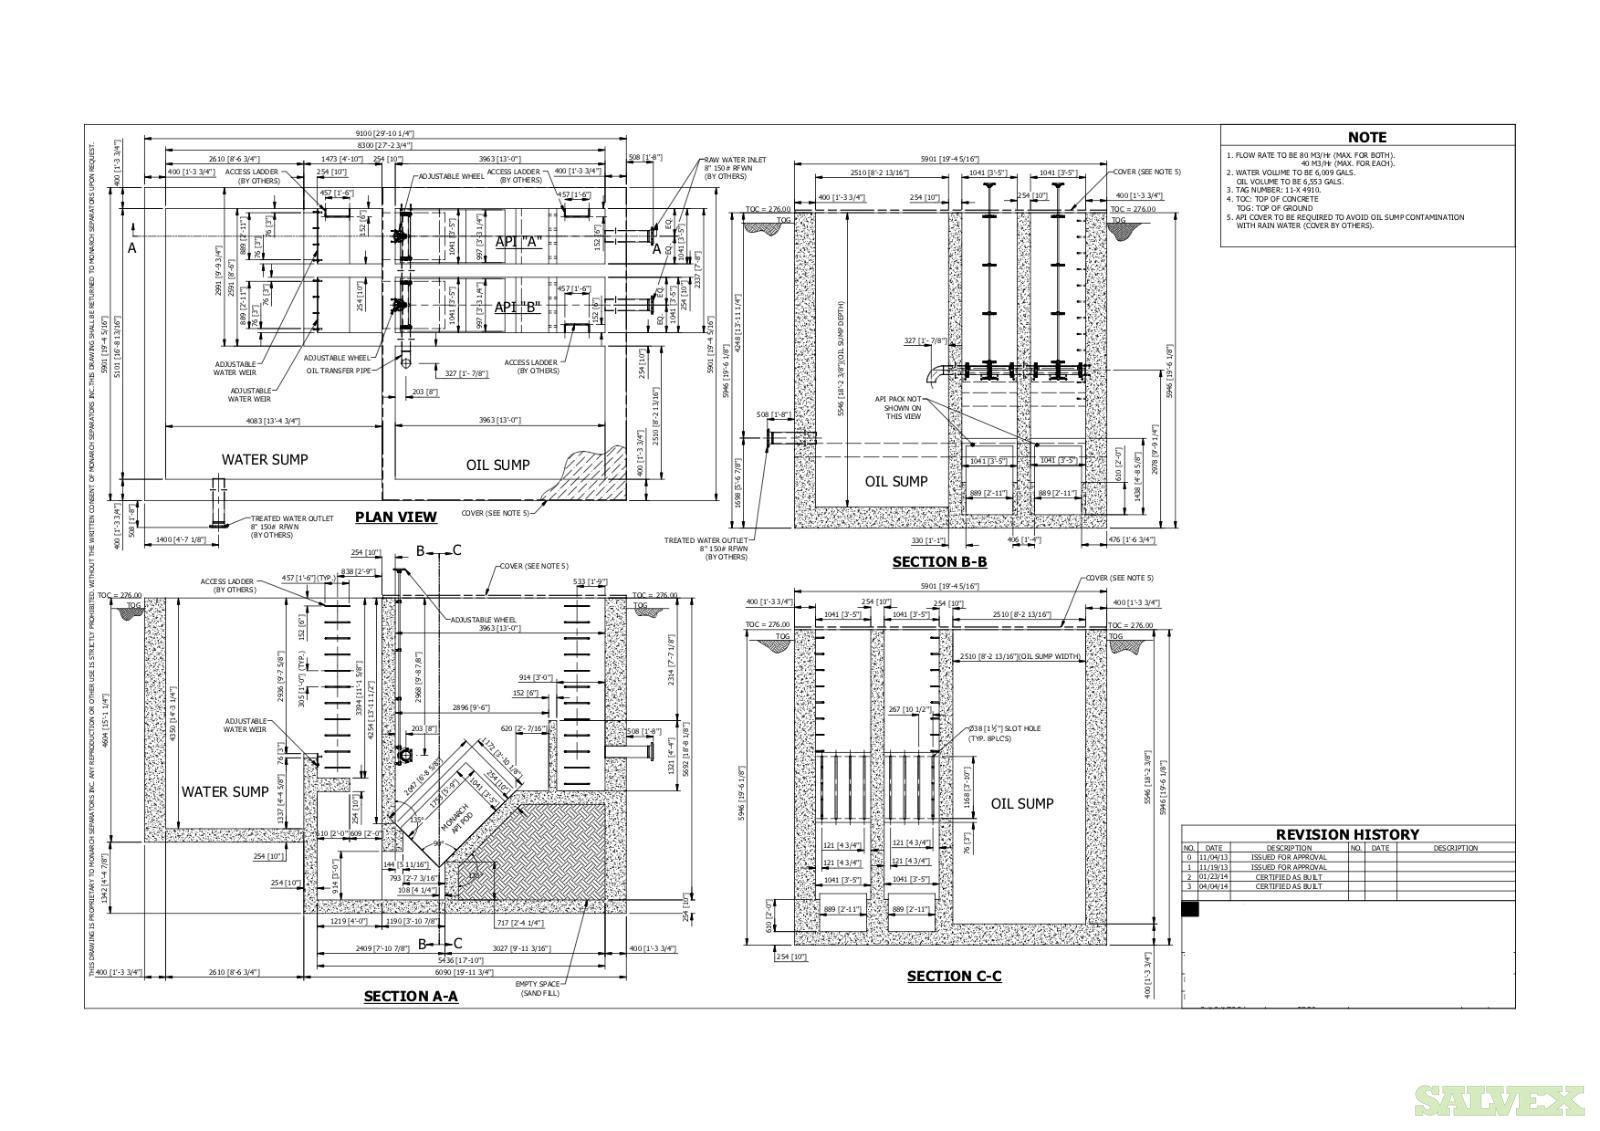 Oil-Water API Separator System (API 421 POD ) MONARCH